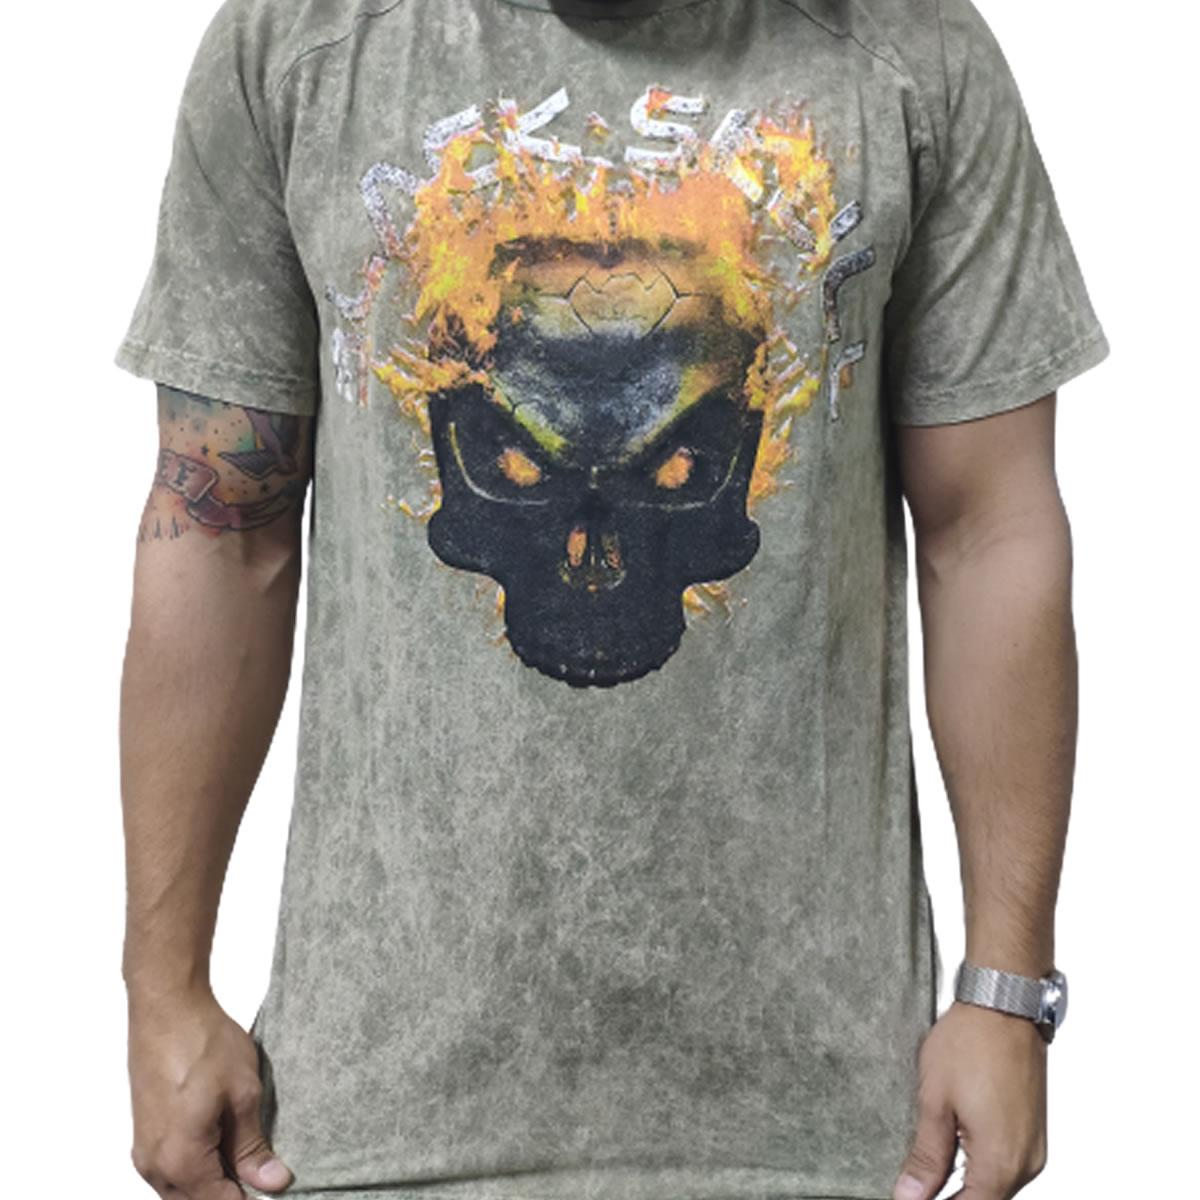 Camiseta Skull Fire Cinza Esverdeado - Black Skull Clothing